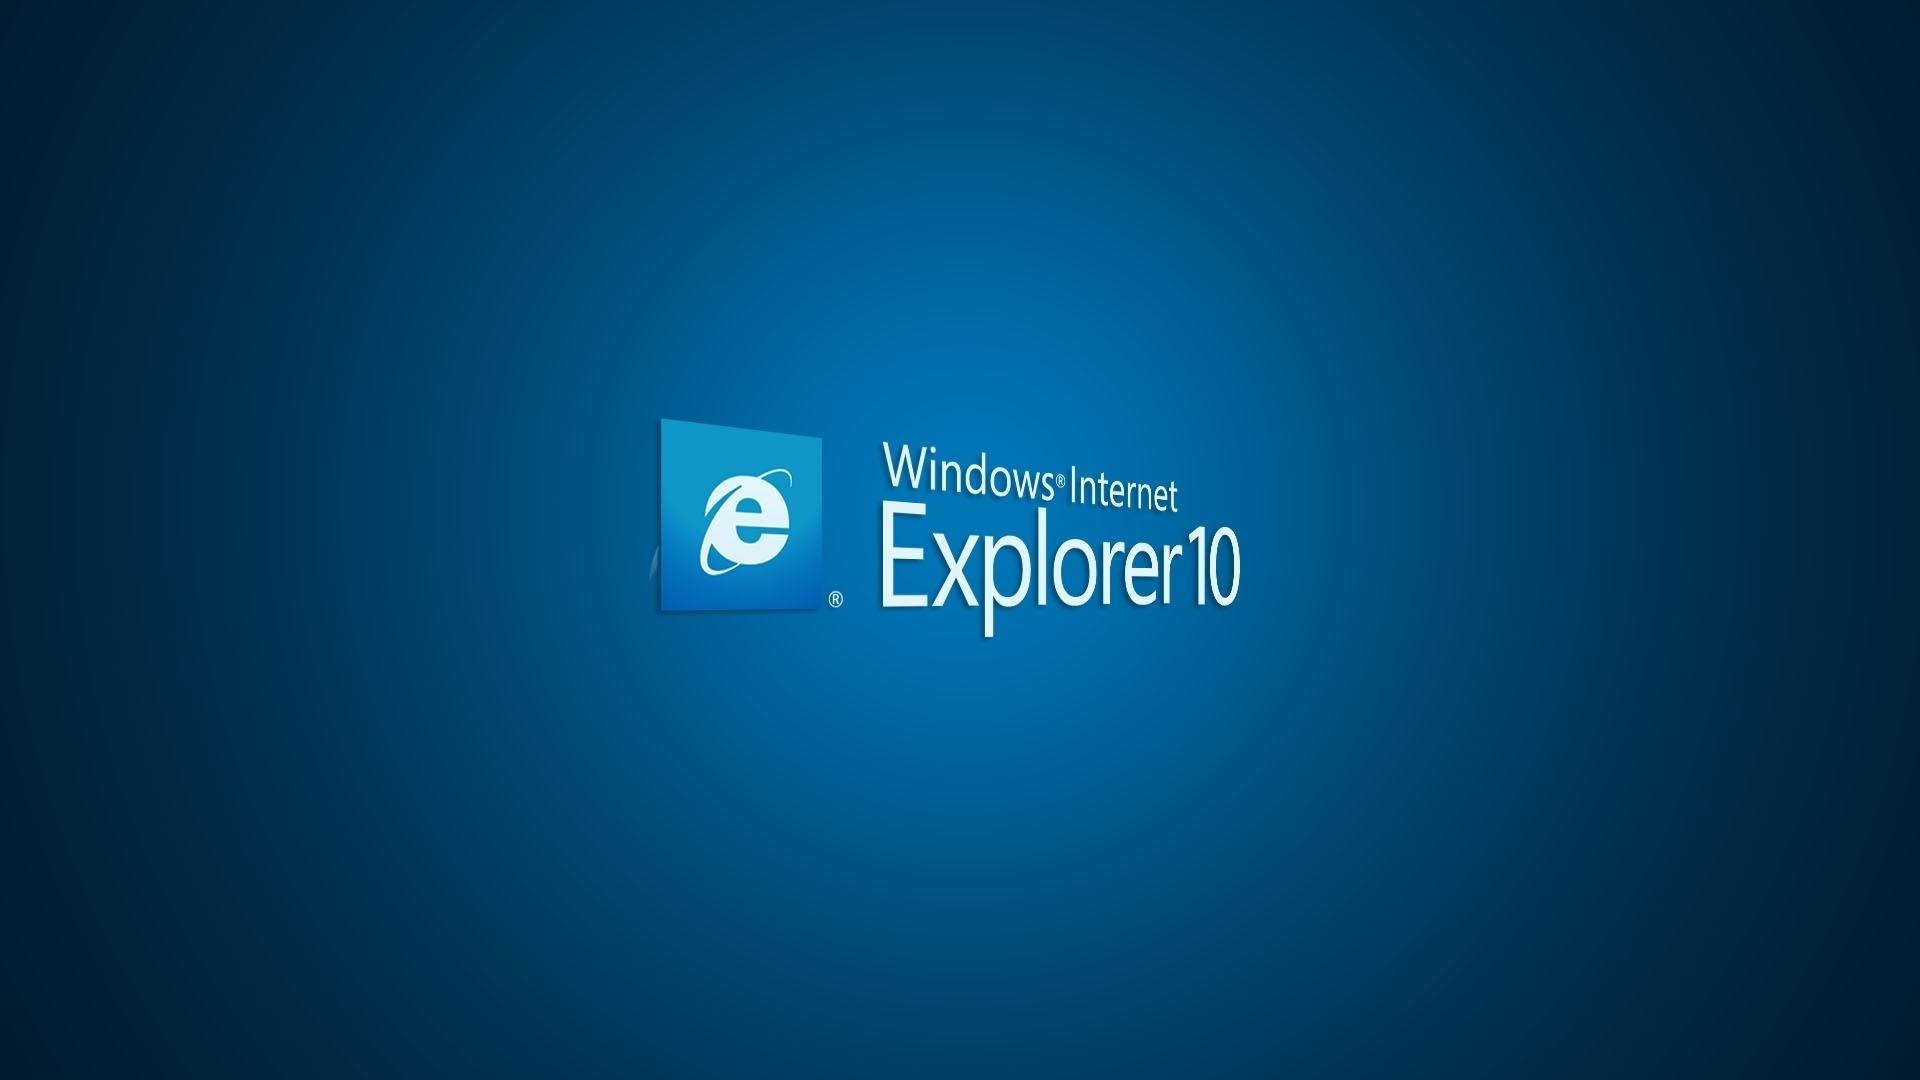 1920x1080 Microsoft Windows Internet Explorer 10 desktop PC and Mac 1920x1080